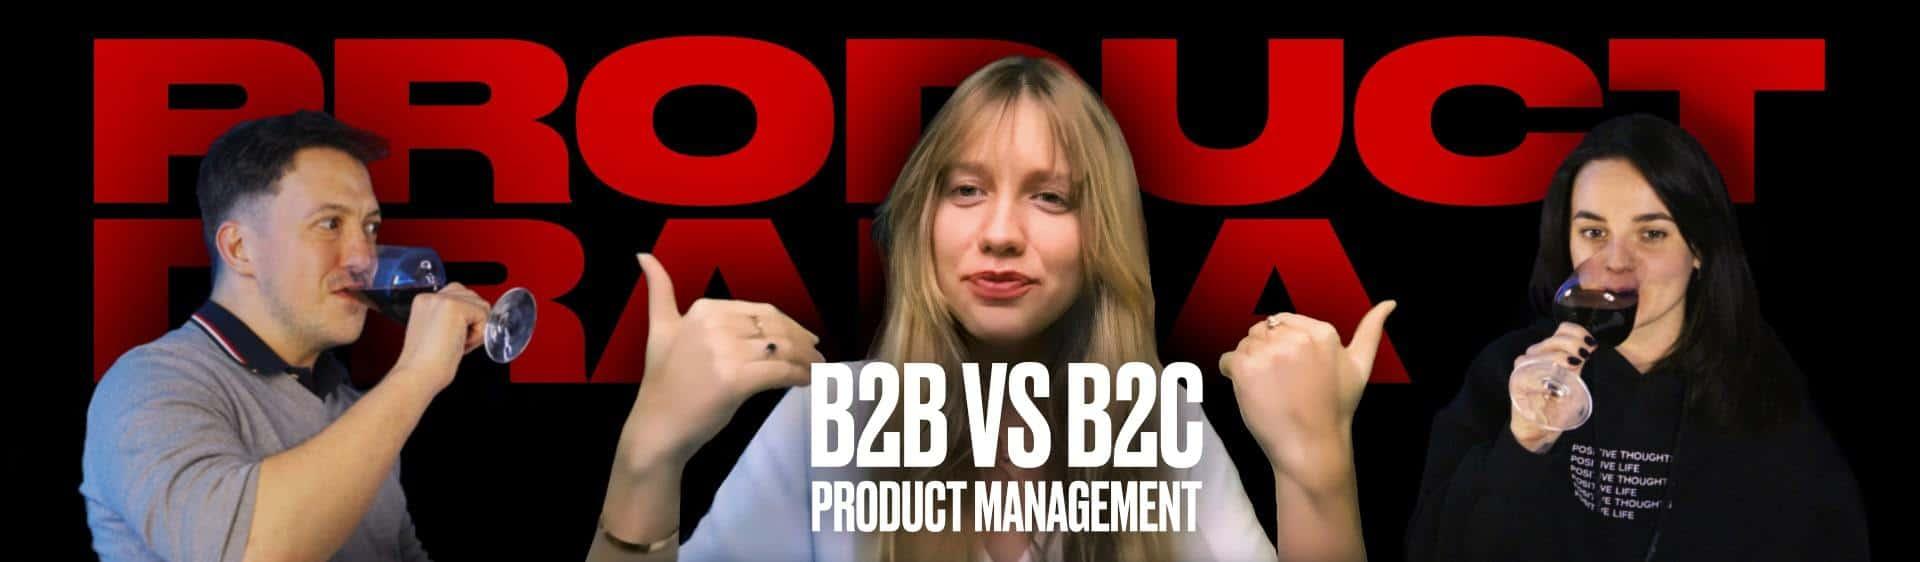 Product Drama Podcast 3: B2B vs. B2C Product Management